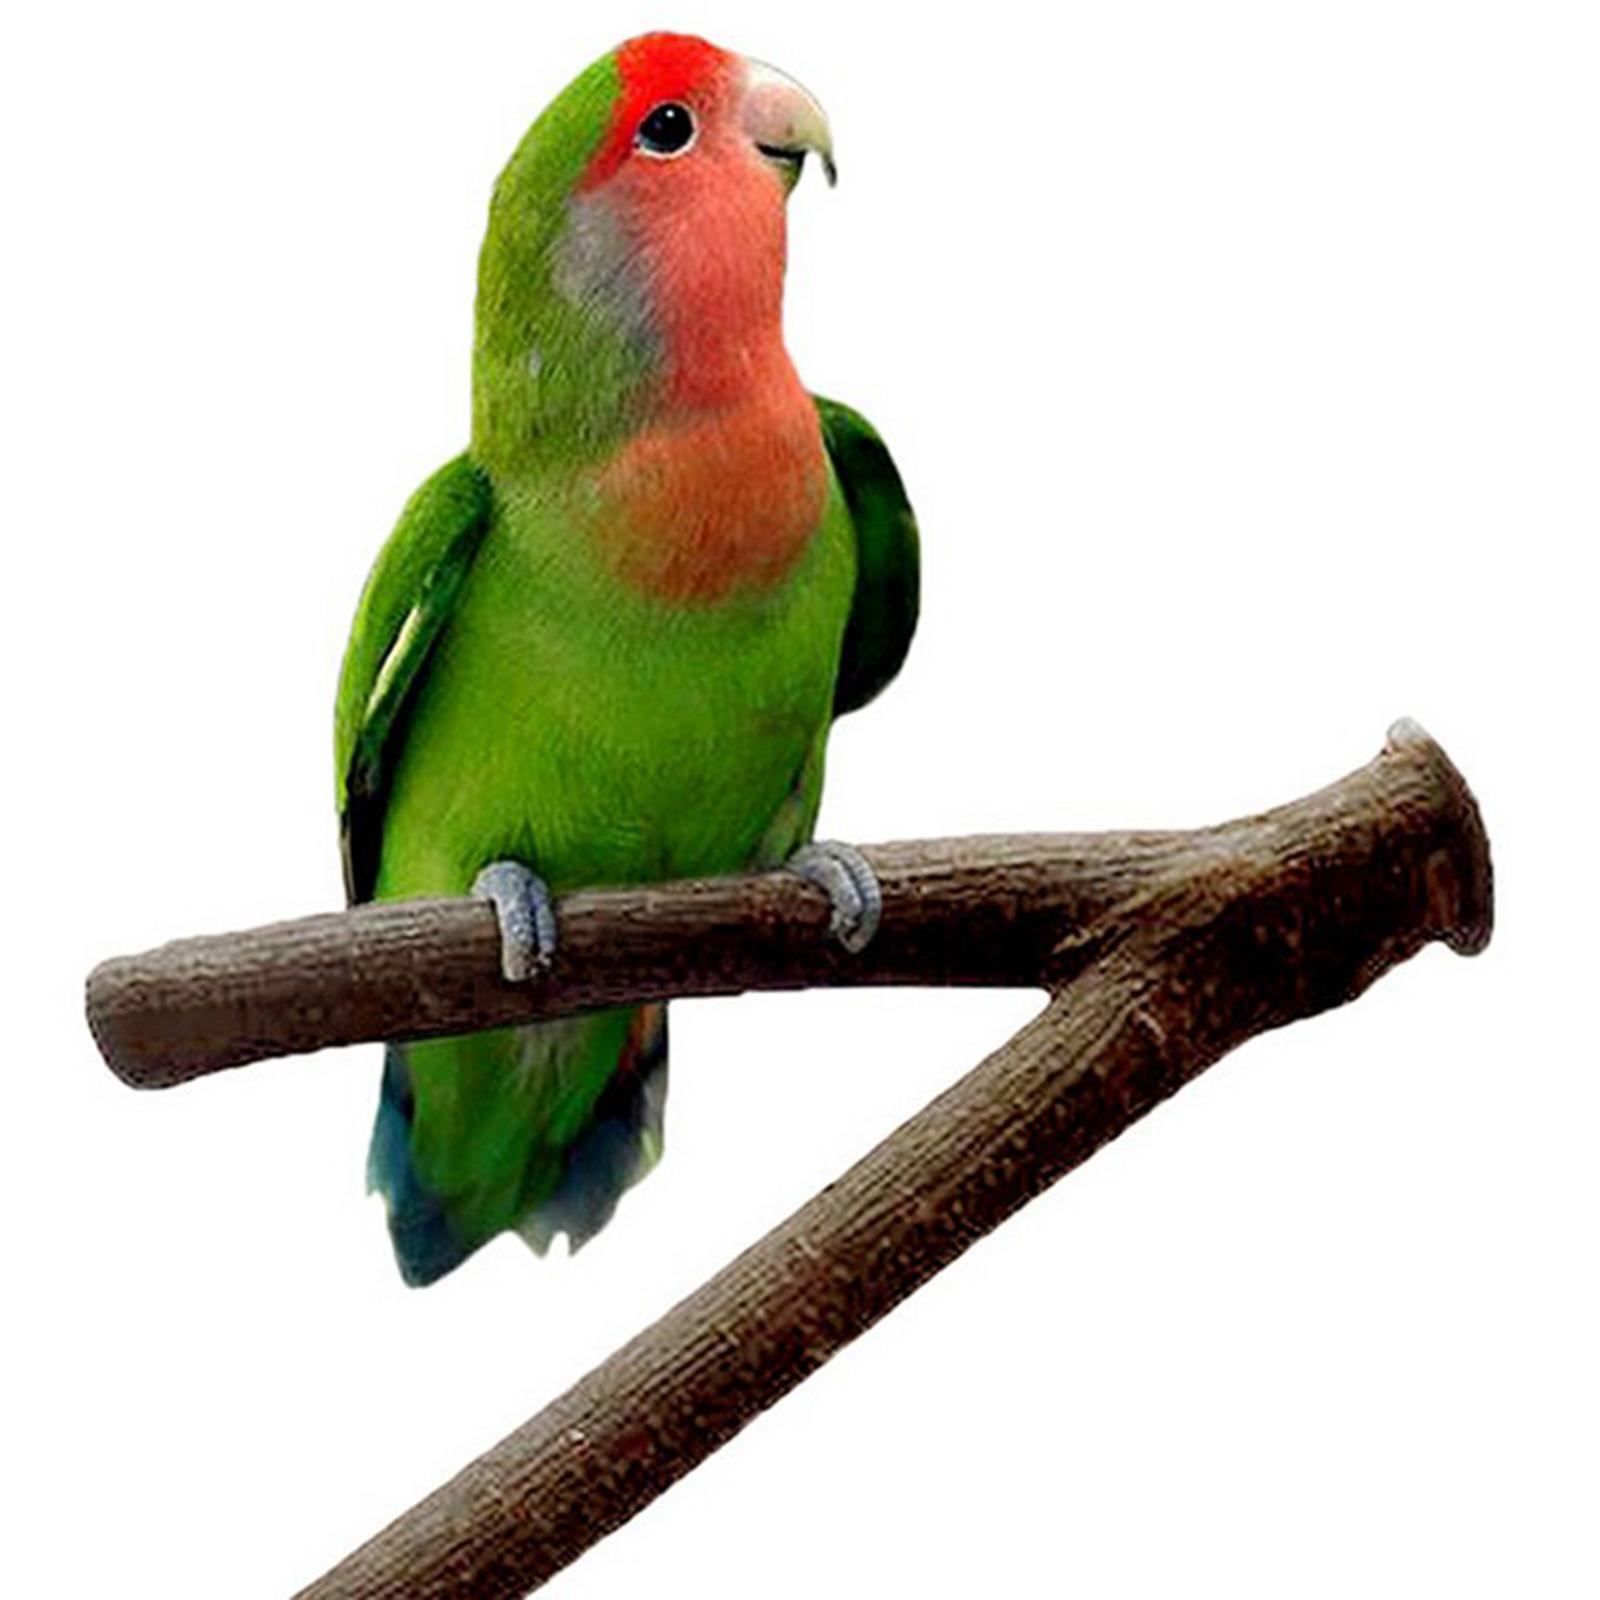 thumbnail 18 - Bird-Perch-Wood-Stand-Bird-Cage-Swing-Branch-for-Parrot-Parakeet-Cockatiel